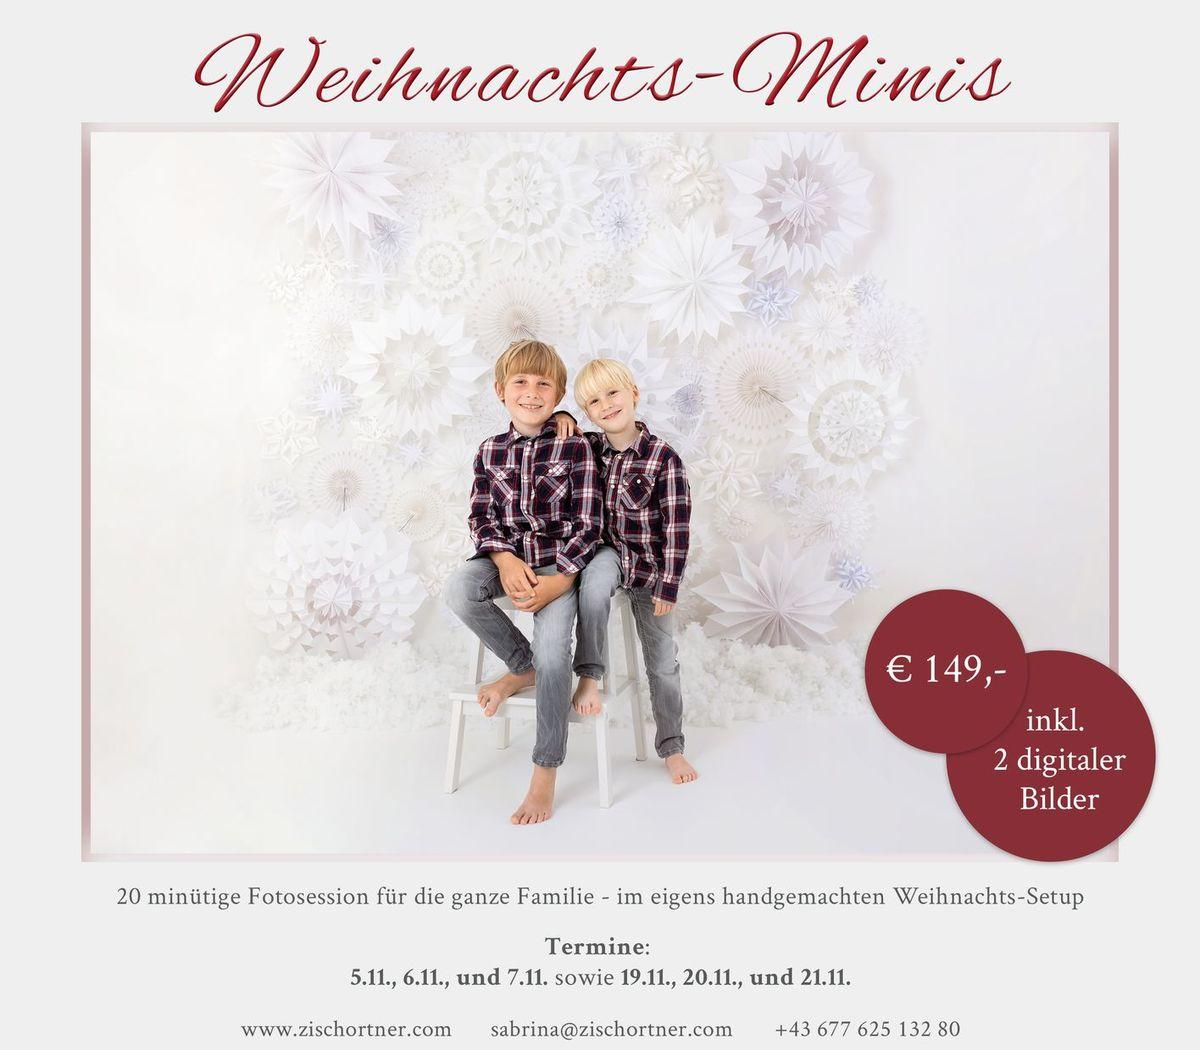 Weihnachtsmini Fotoshooting 2021 Familie Kinder Sabrina Zisch Ortner Wien